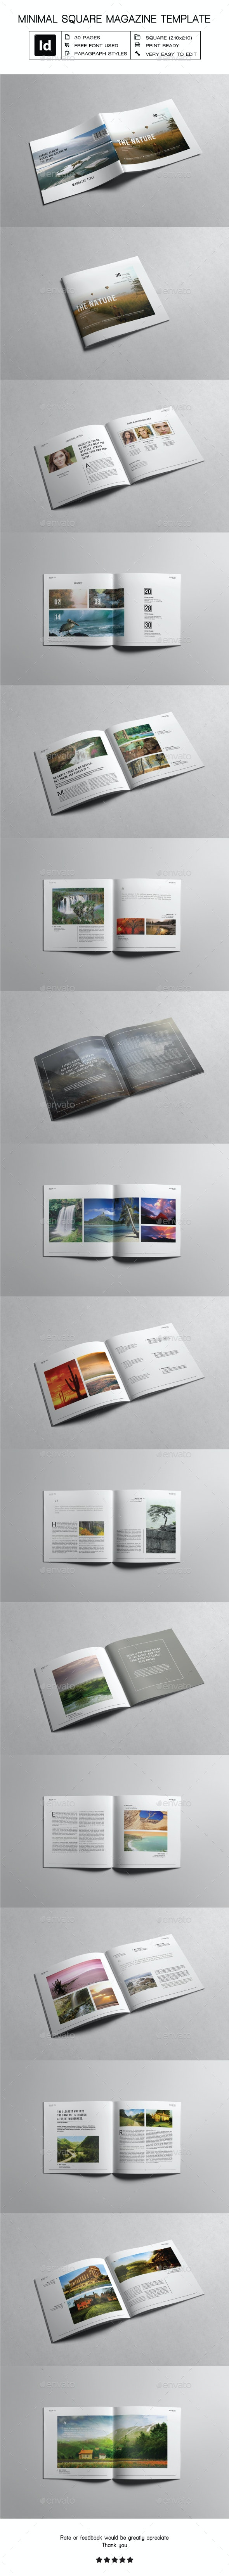 Minimal Square Magazine Template III - Magazines Print Templates